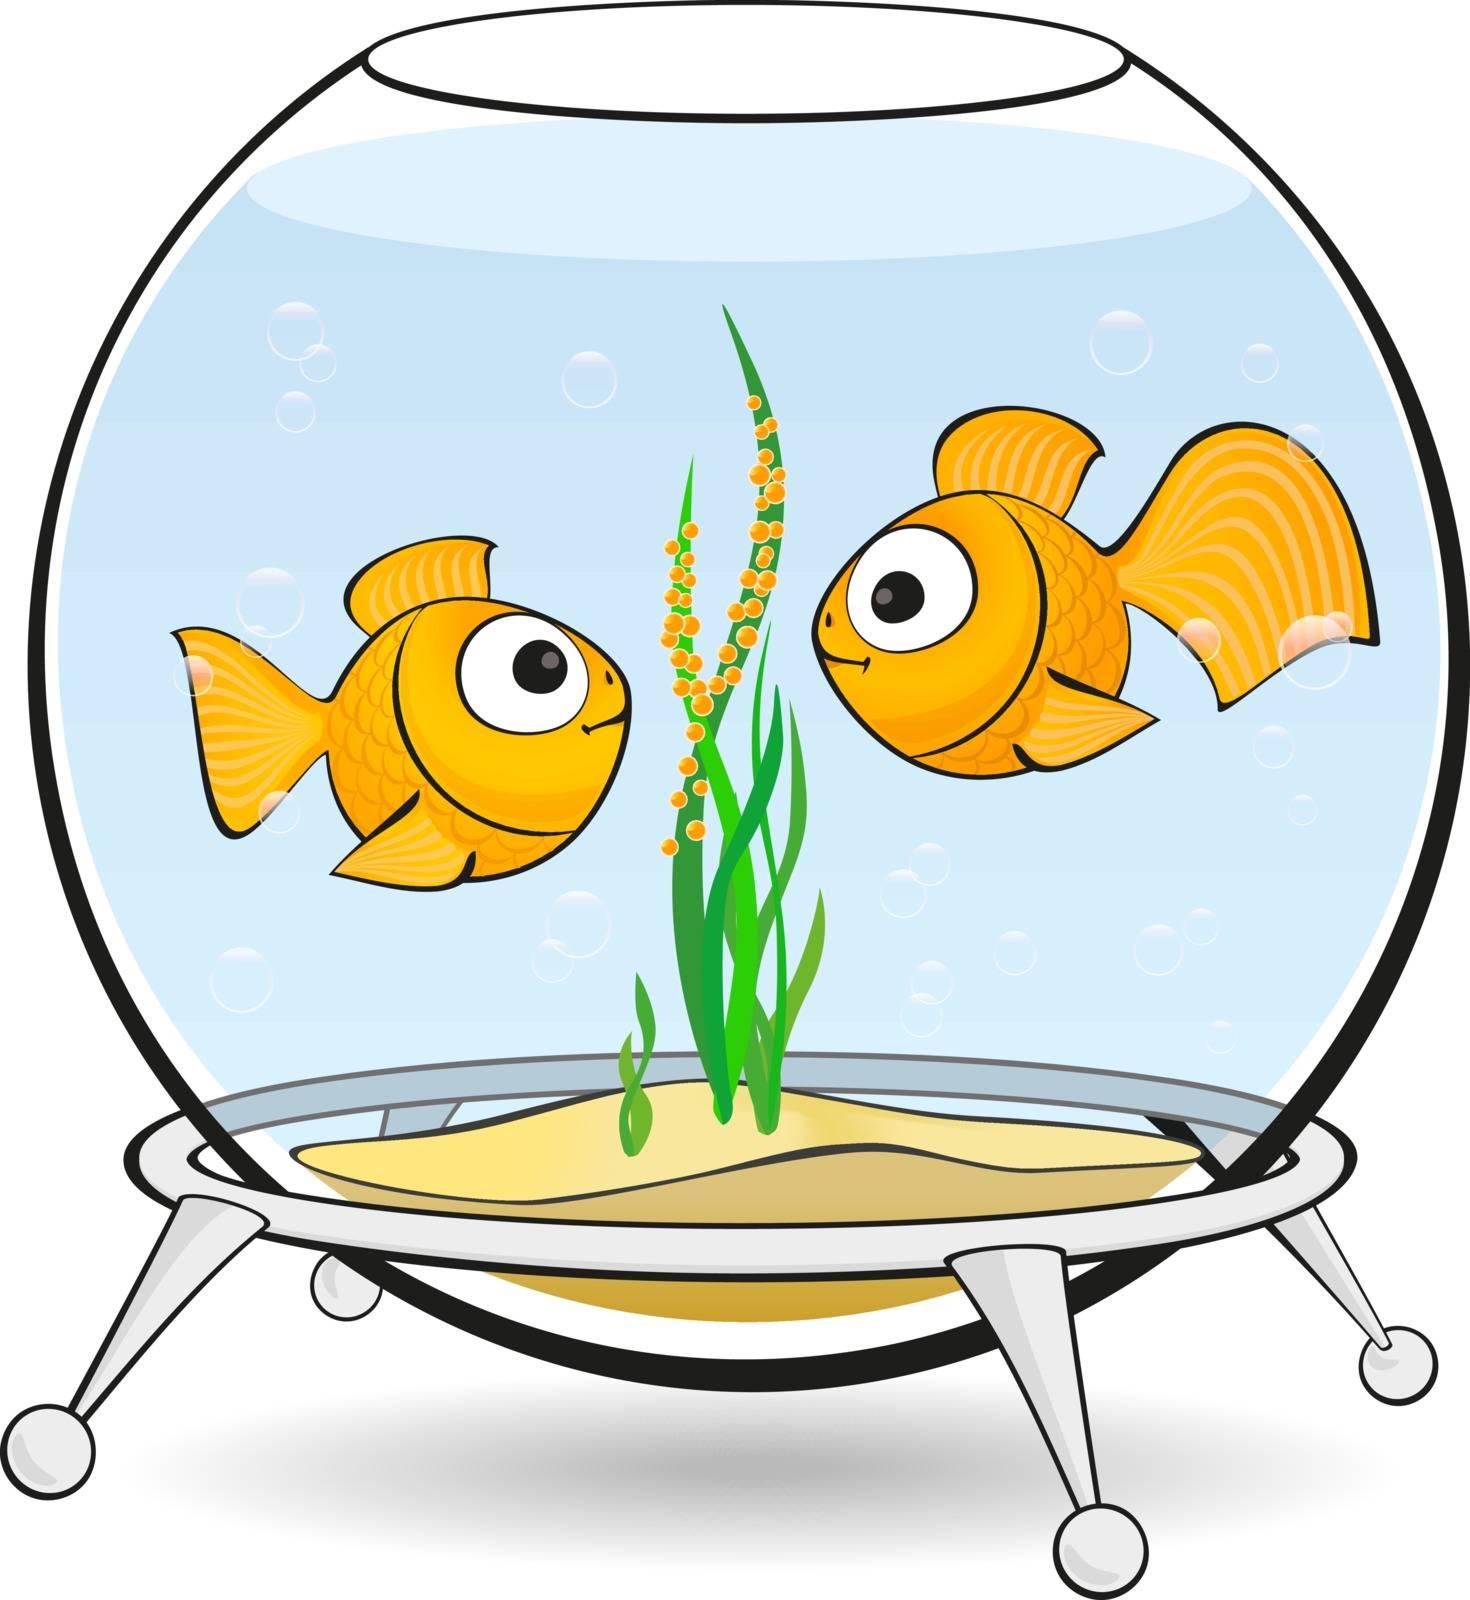 couple goldfish in an aquarium looking at caviar